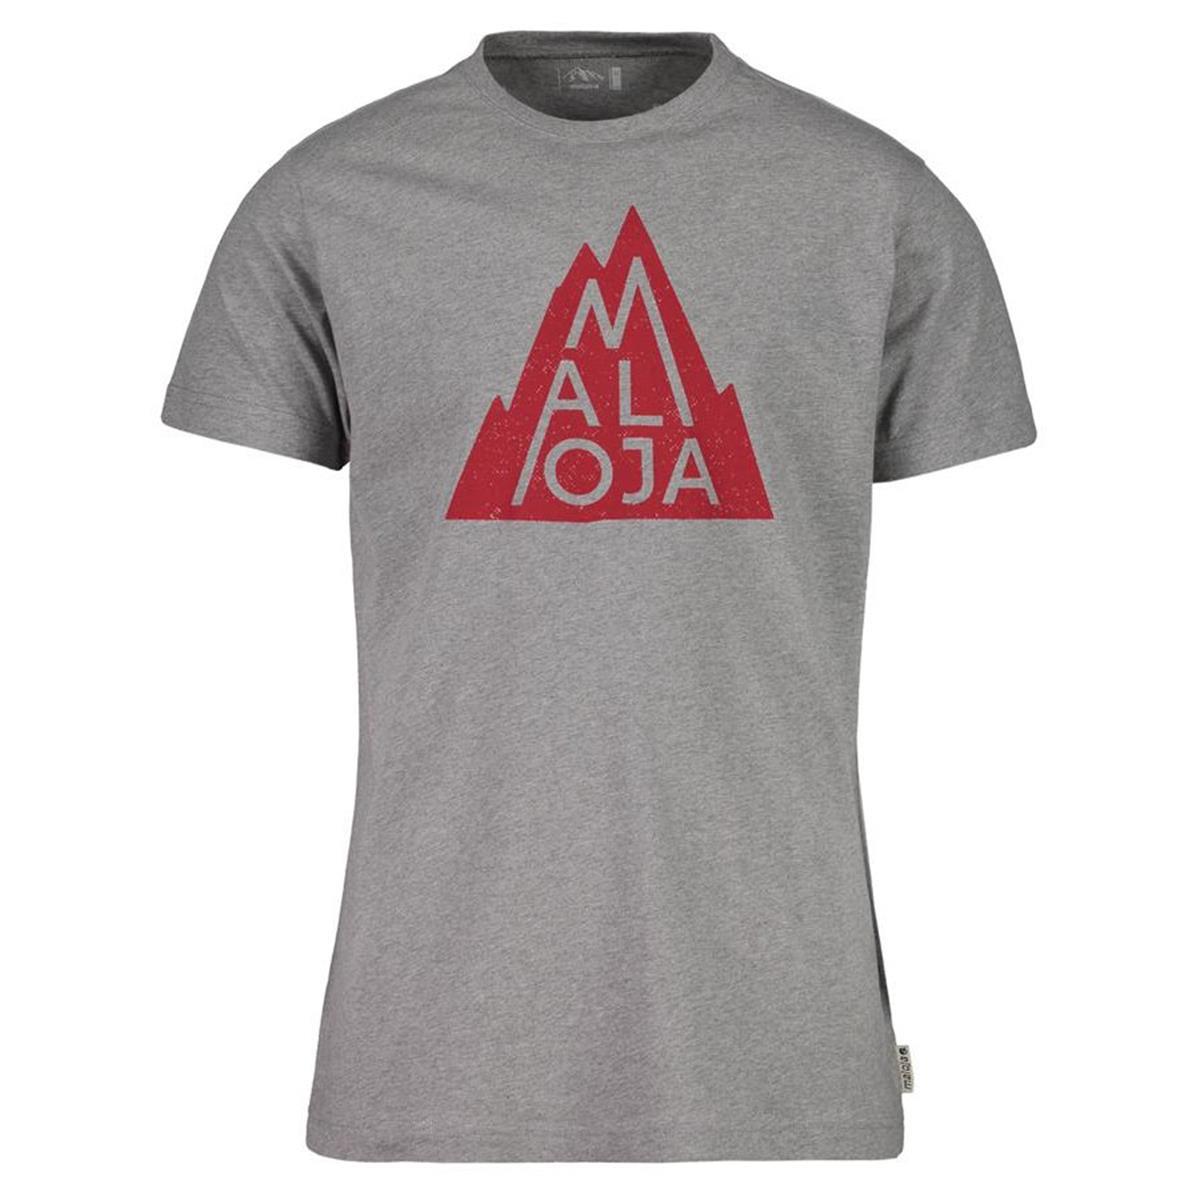 Maloja T-Shirt ChristiamM. Grey Melange